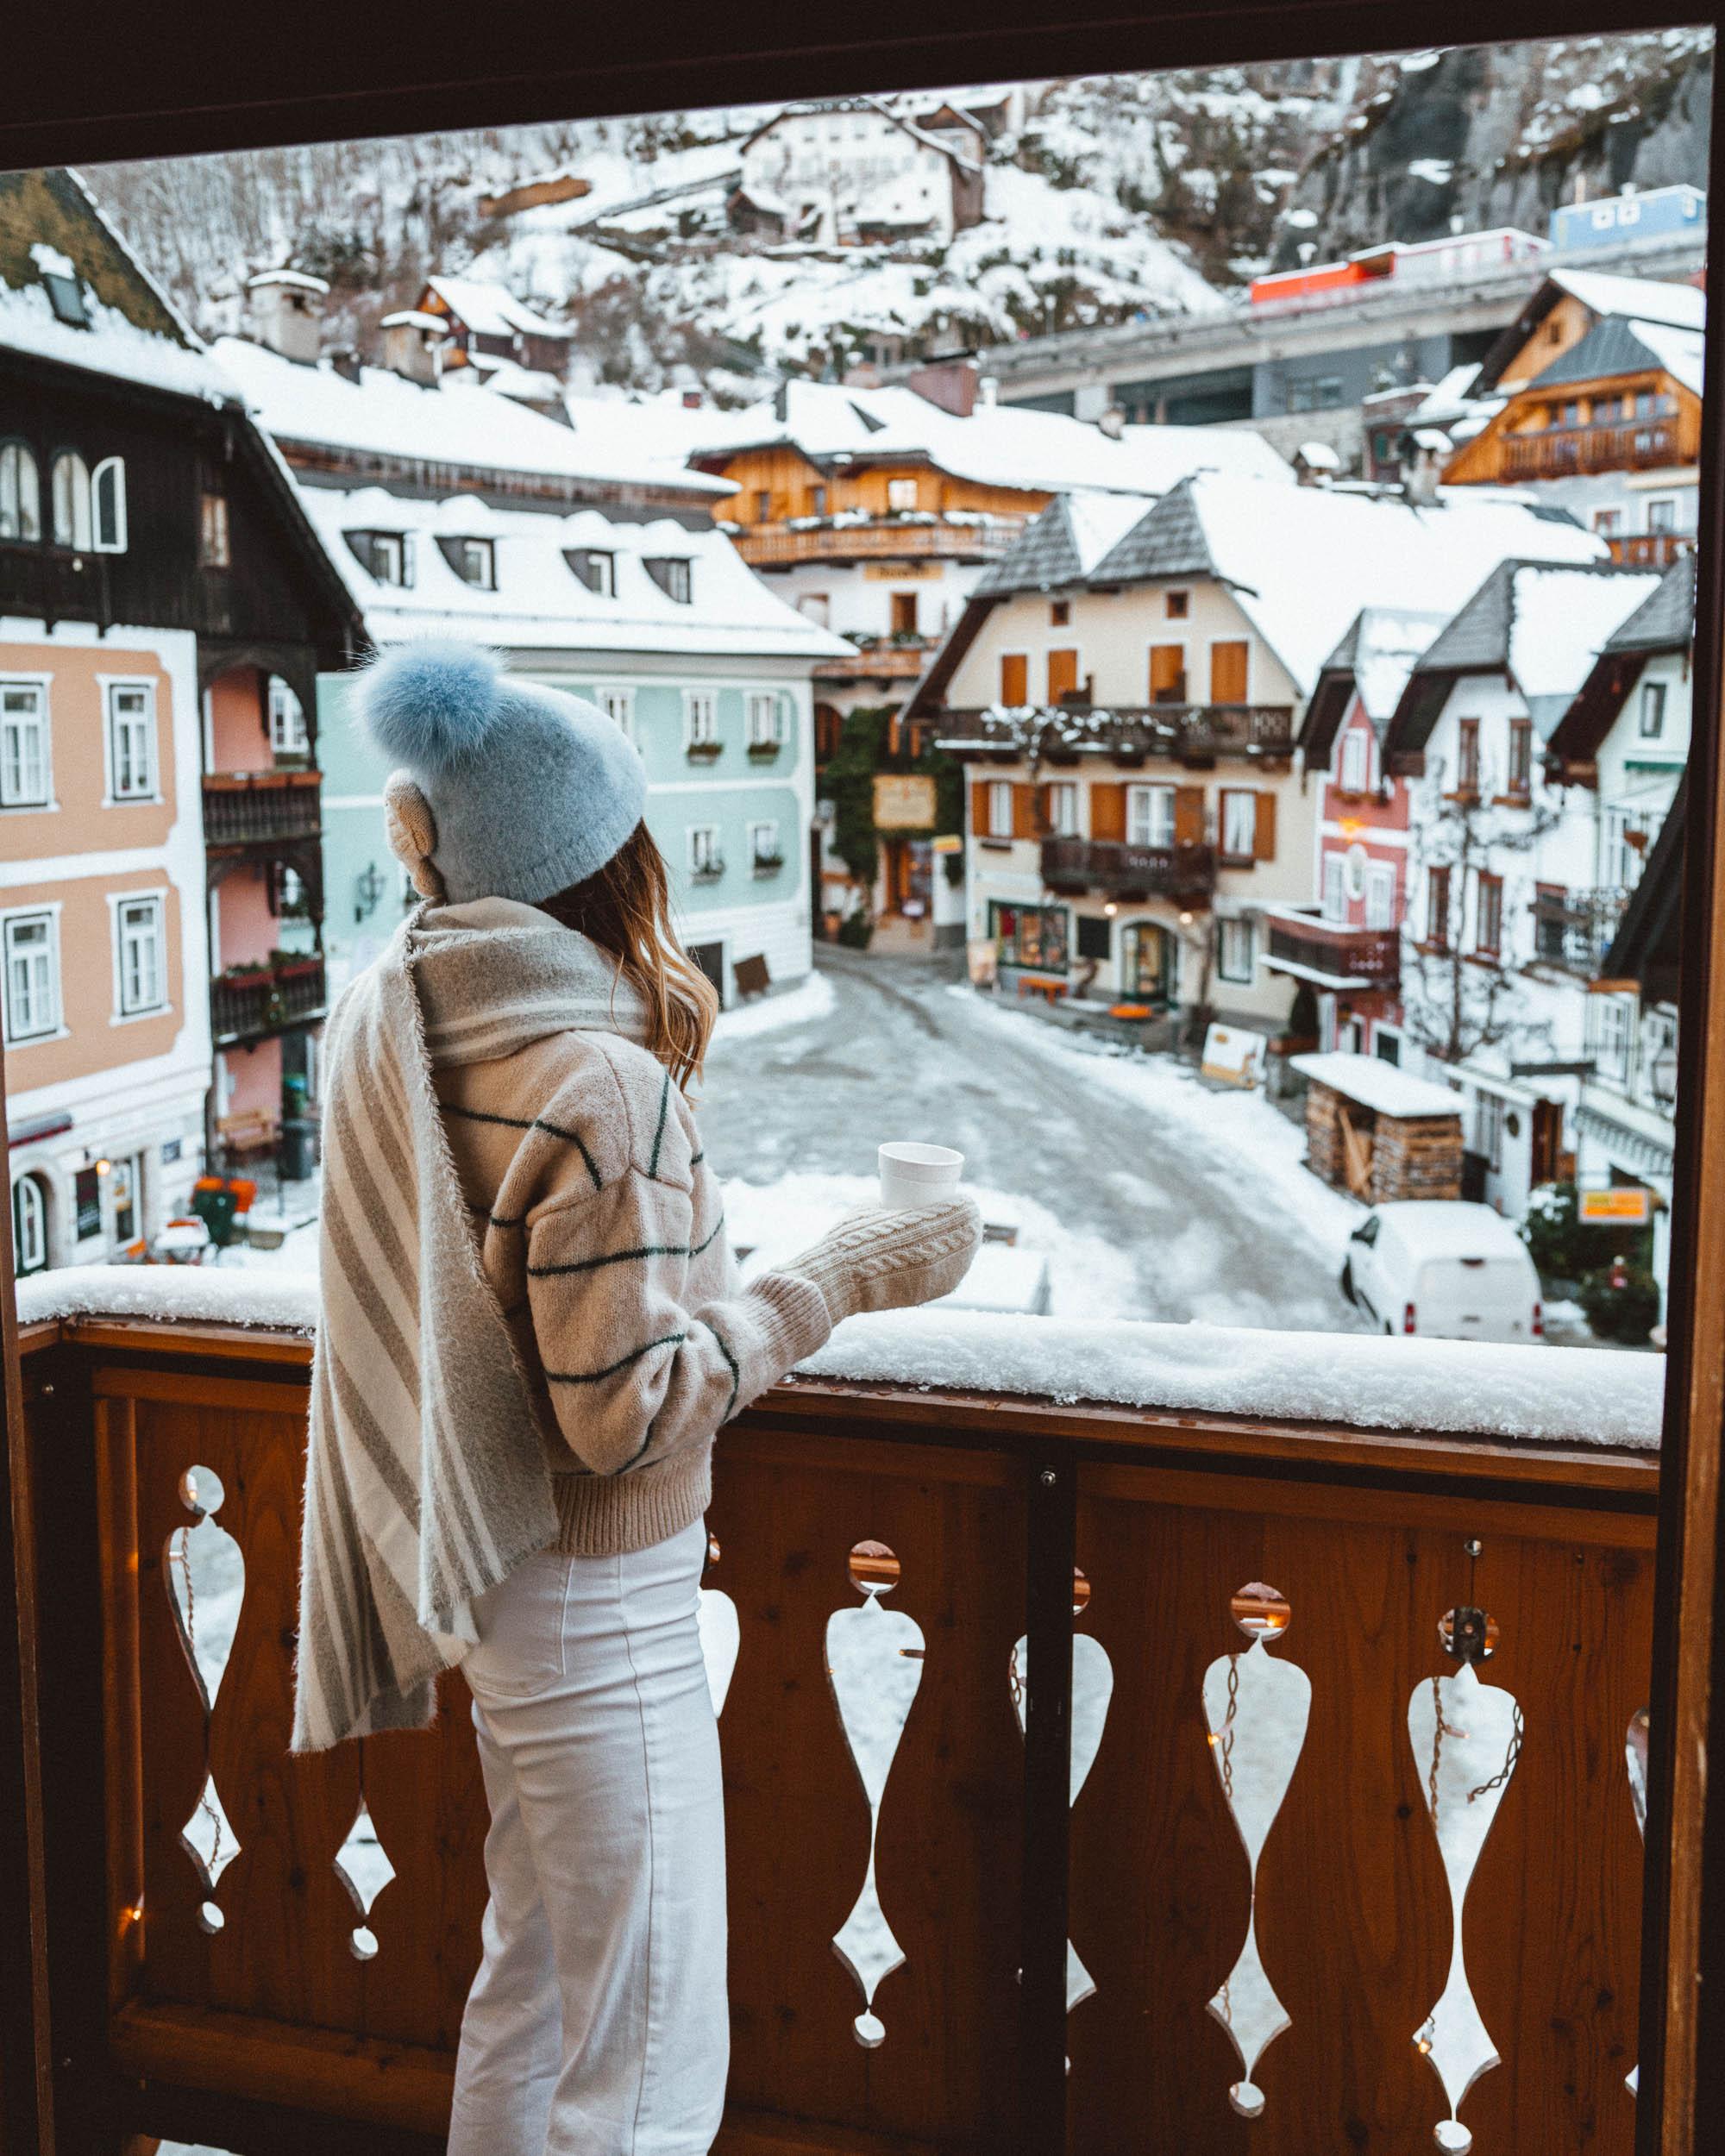 Balcony at seehotel gruner baum Hallstatt hotel in Austria